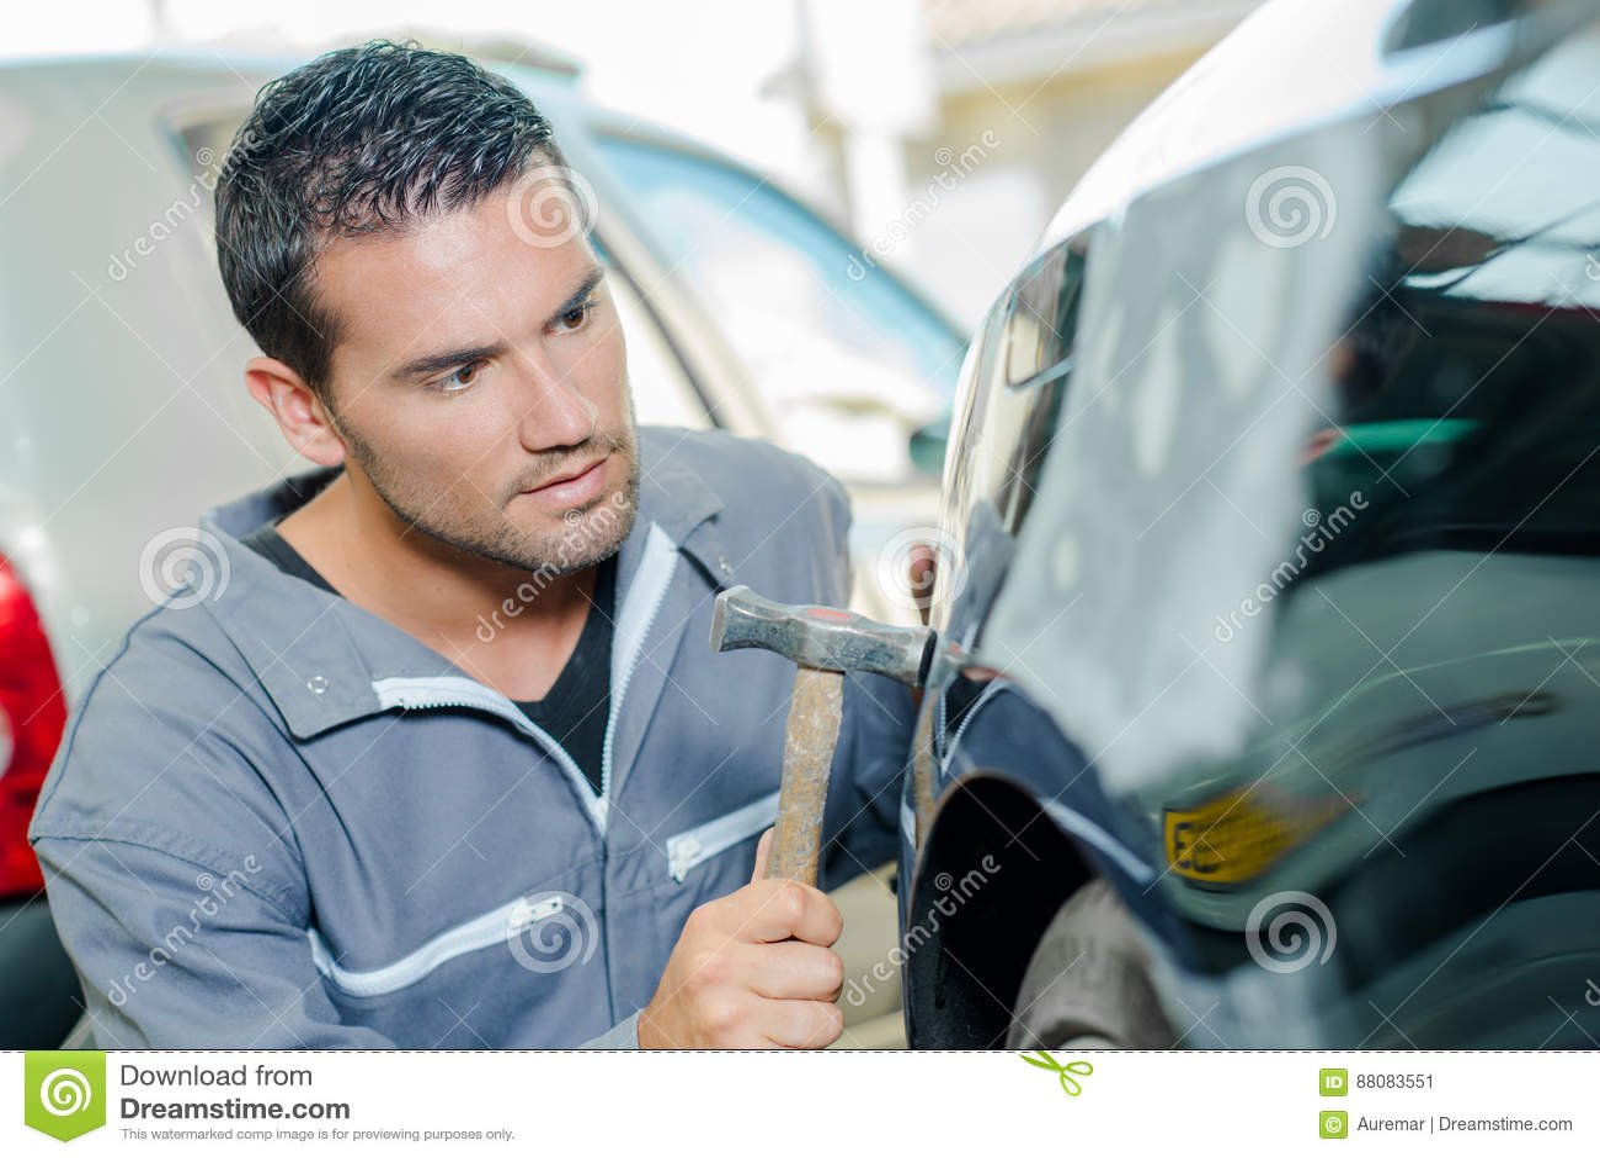 Mechanic panel beating car